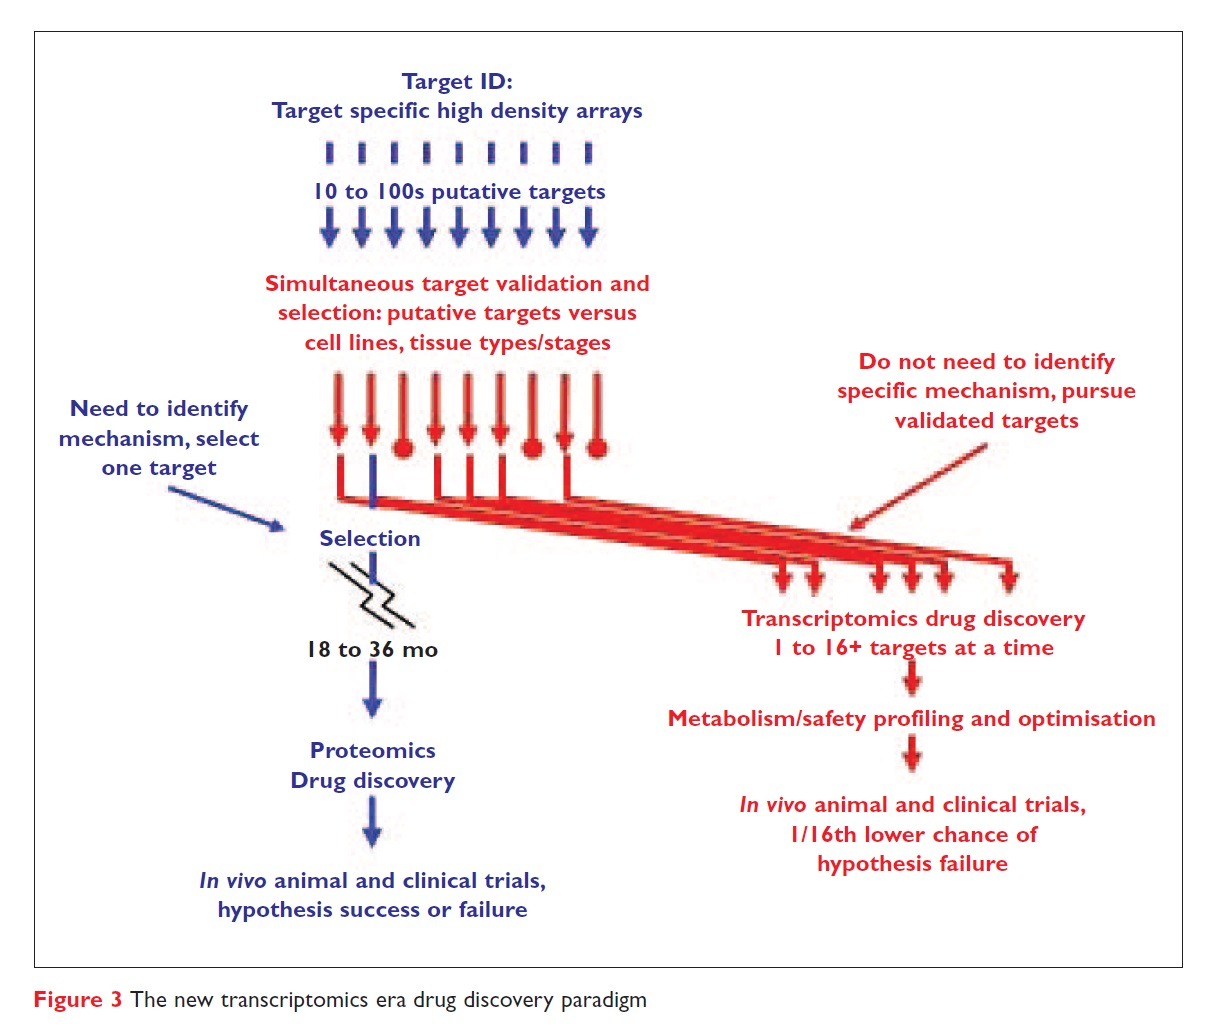 Figure 3 The new transcriptomics era drug discovery paradigm